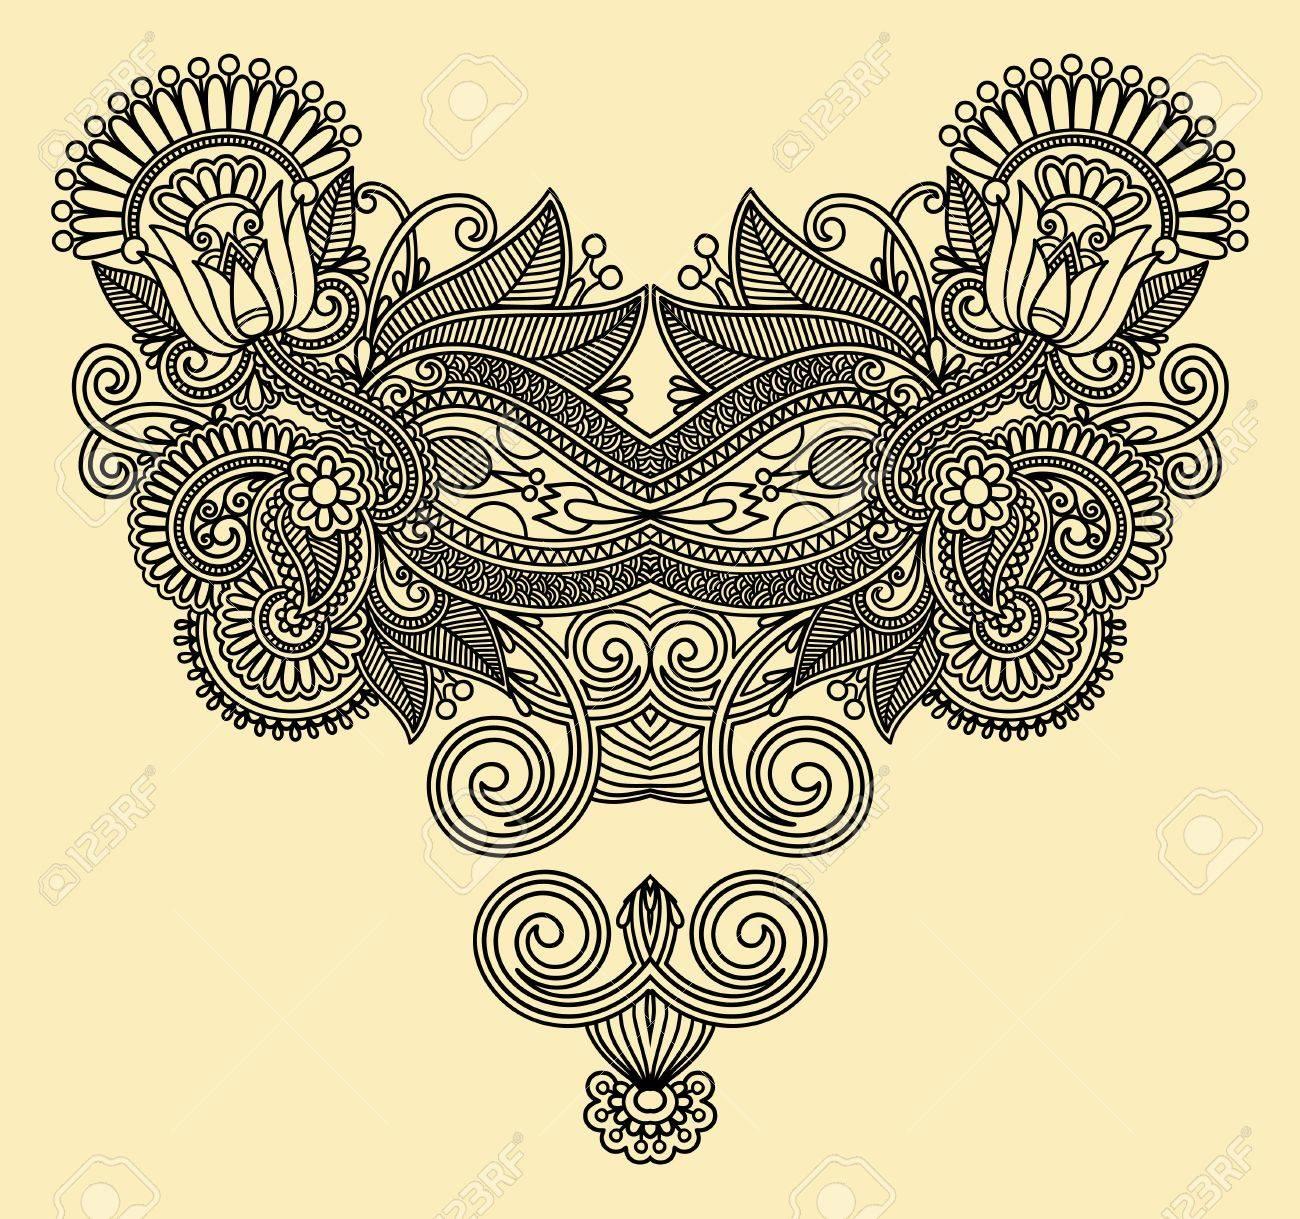 Neckline embroidery fashion Stock Vector - 12976671